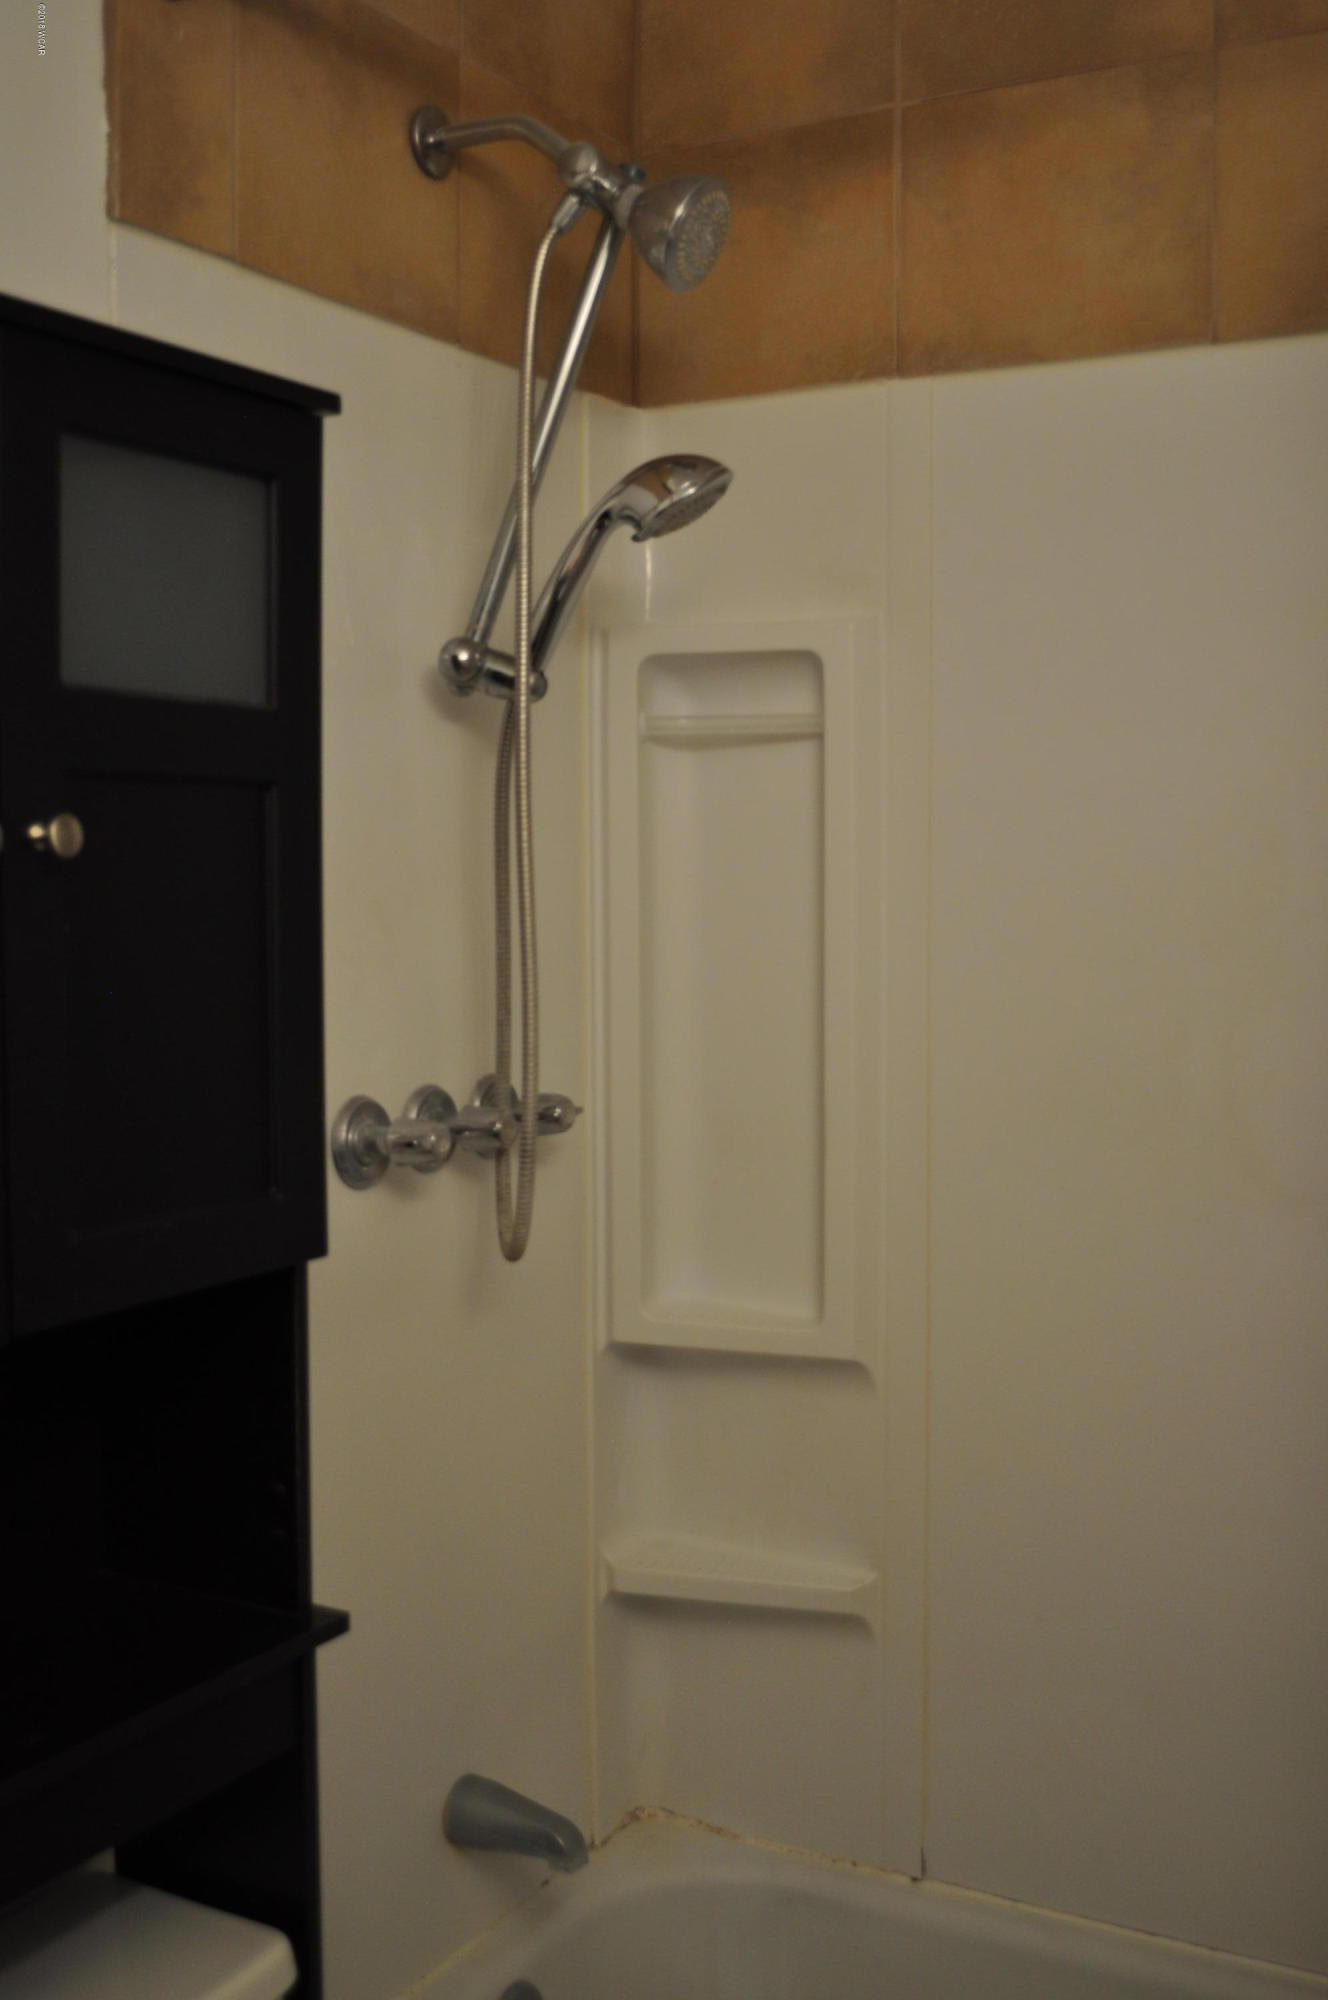 1415 Lincoln Avenue,Montevideo,2 Bedrooms Bedrooms,1 BathroomBathrooms,Single Family,Lincoln Avenue,6032275